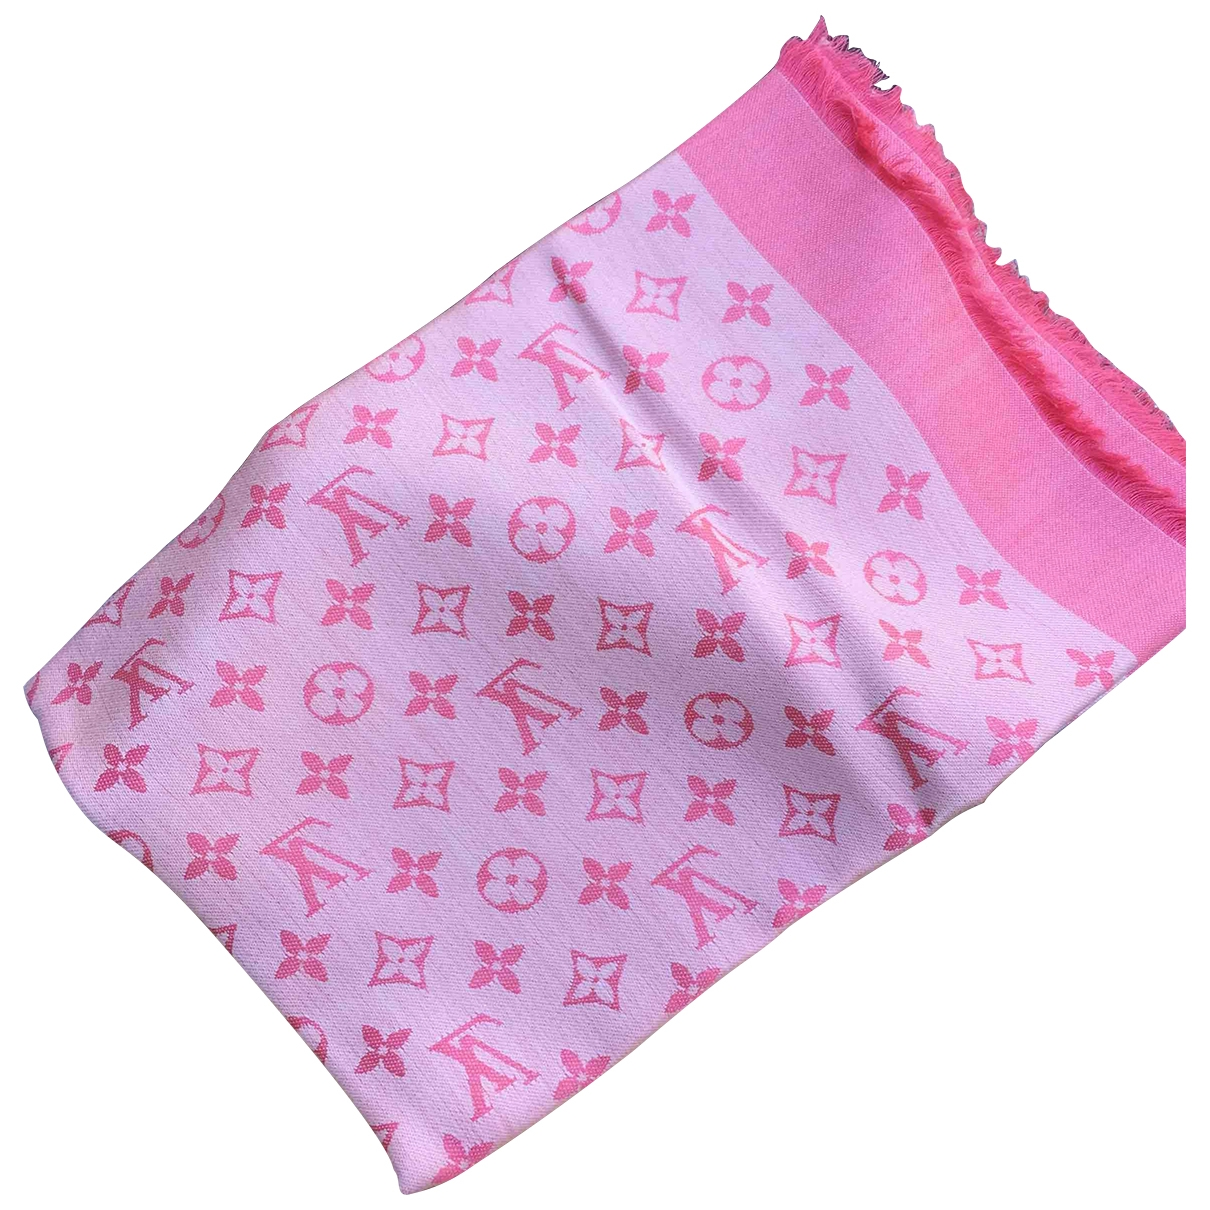 Louis Vuitton Chale Monogram shine Schal in  Rosa Seide